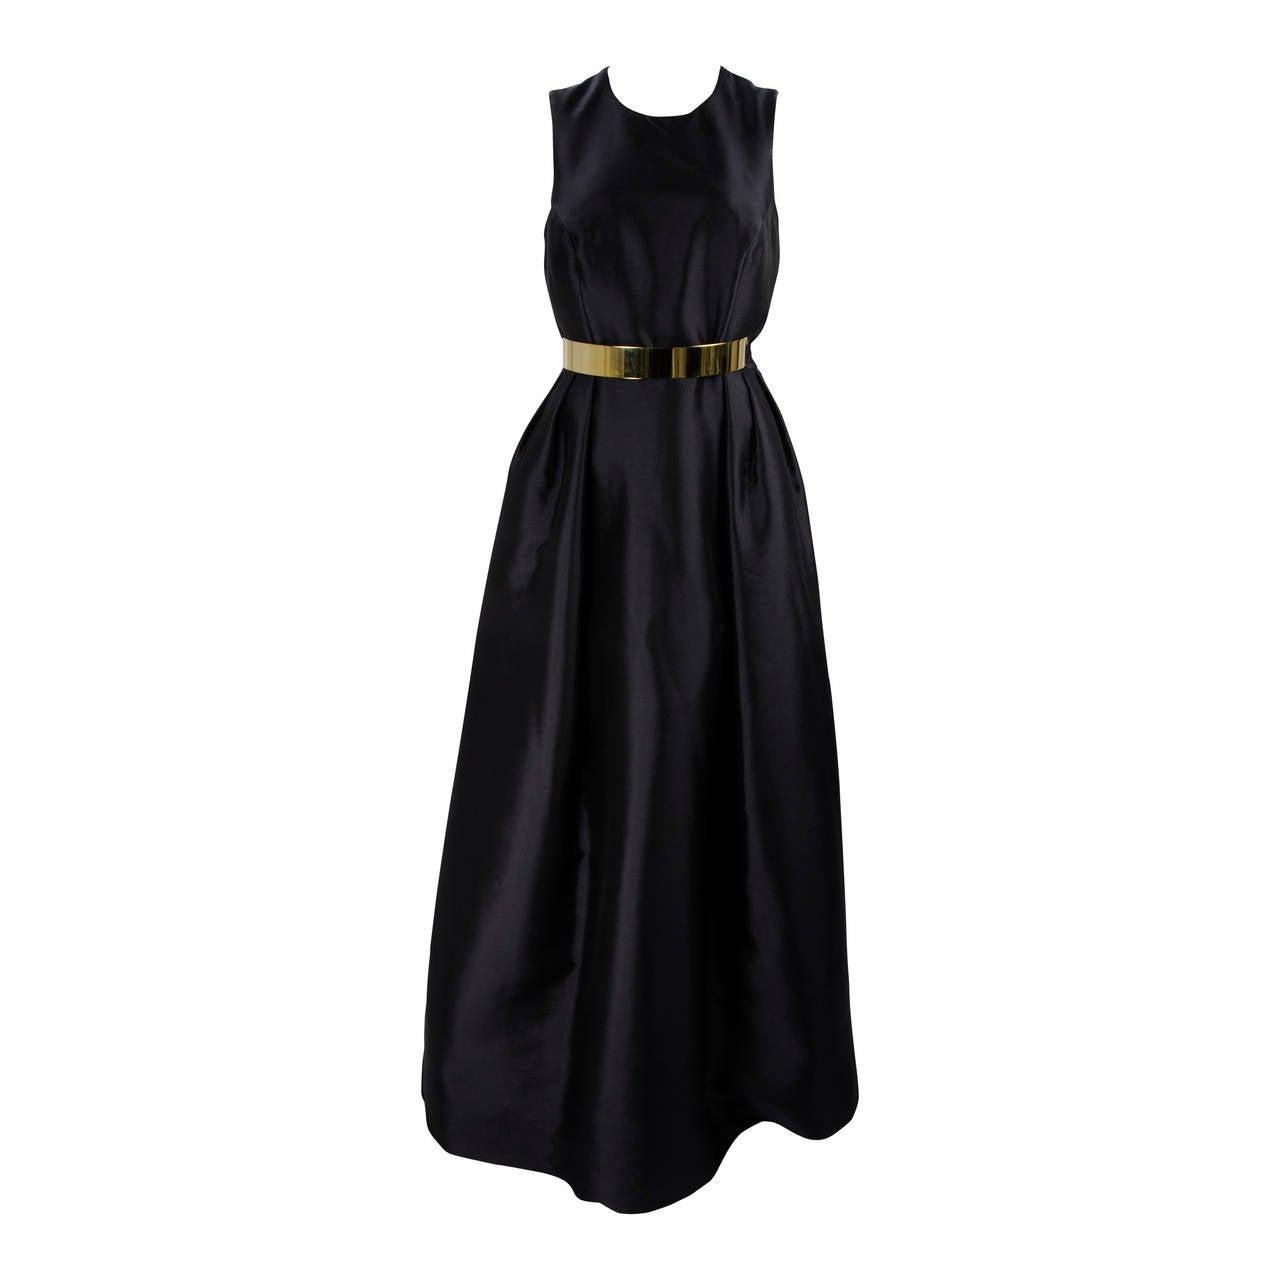 Wayne Clark Black Gold Belted Gown For Sale